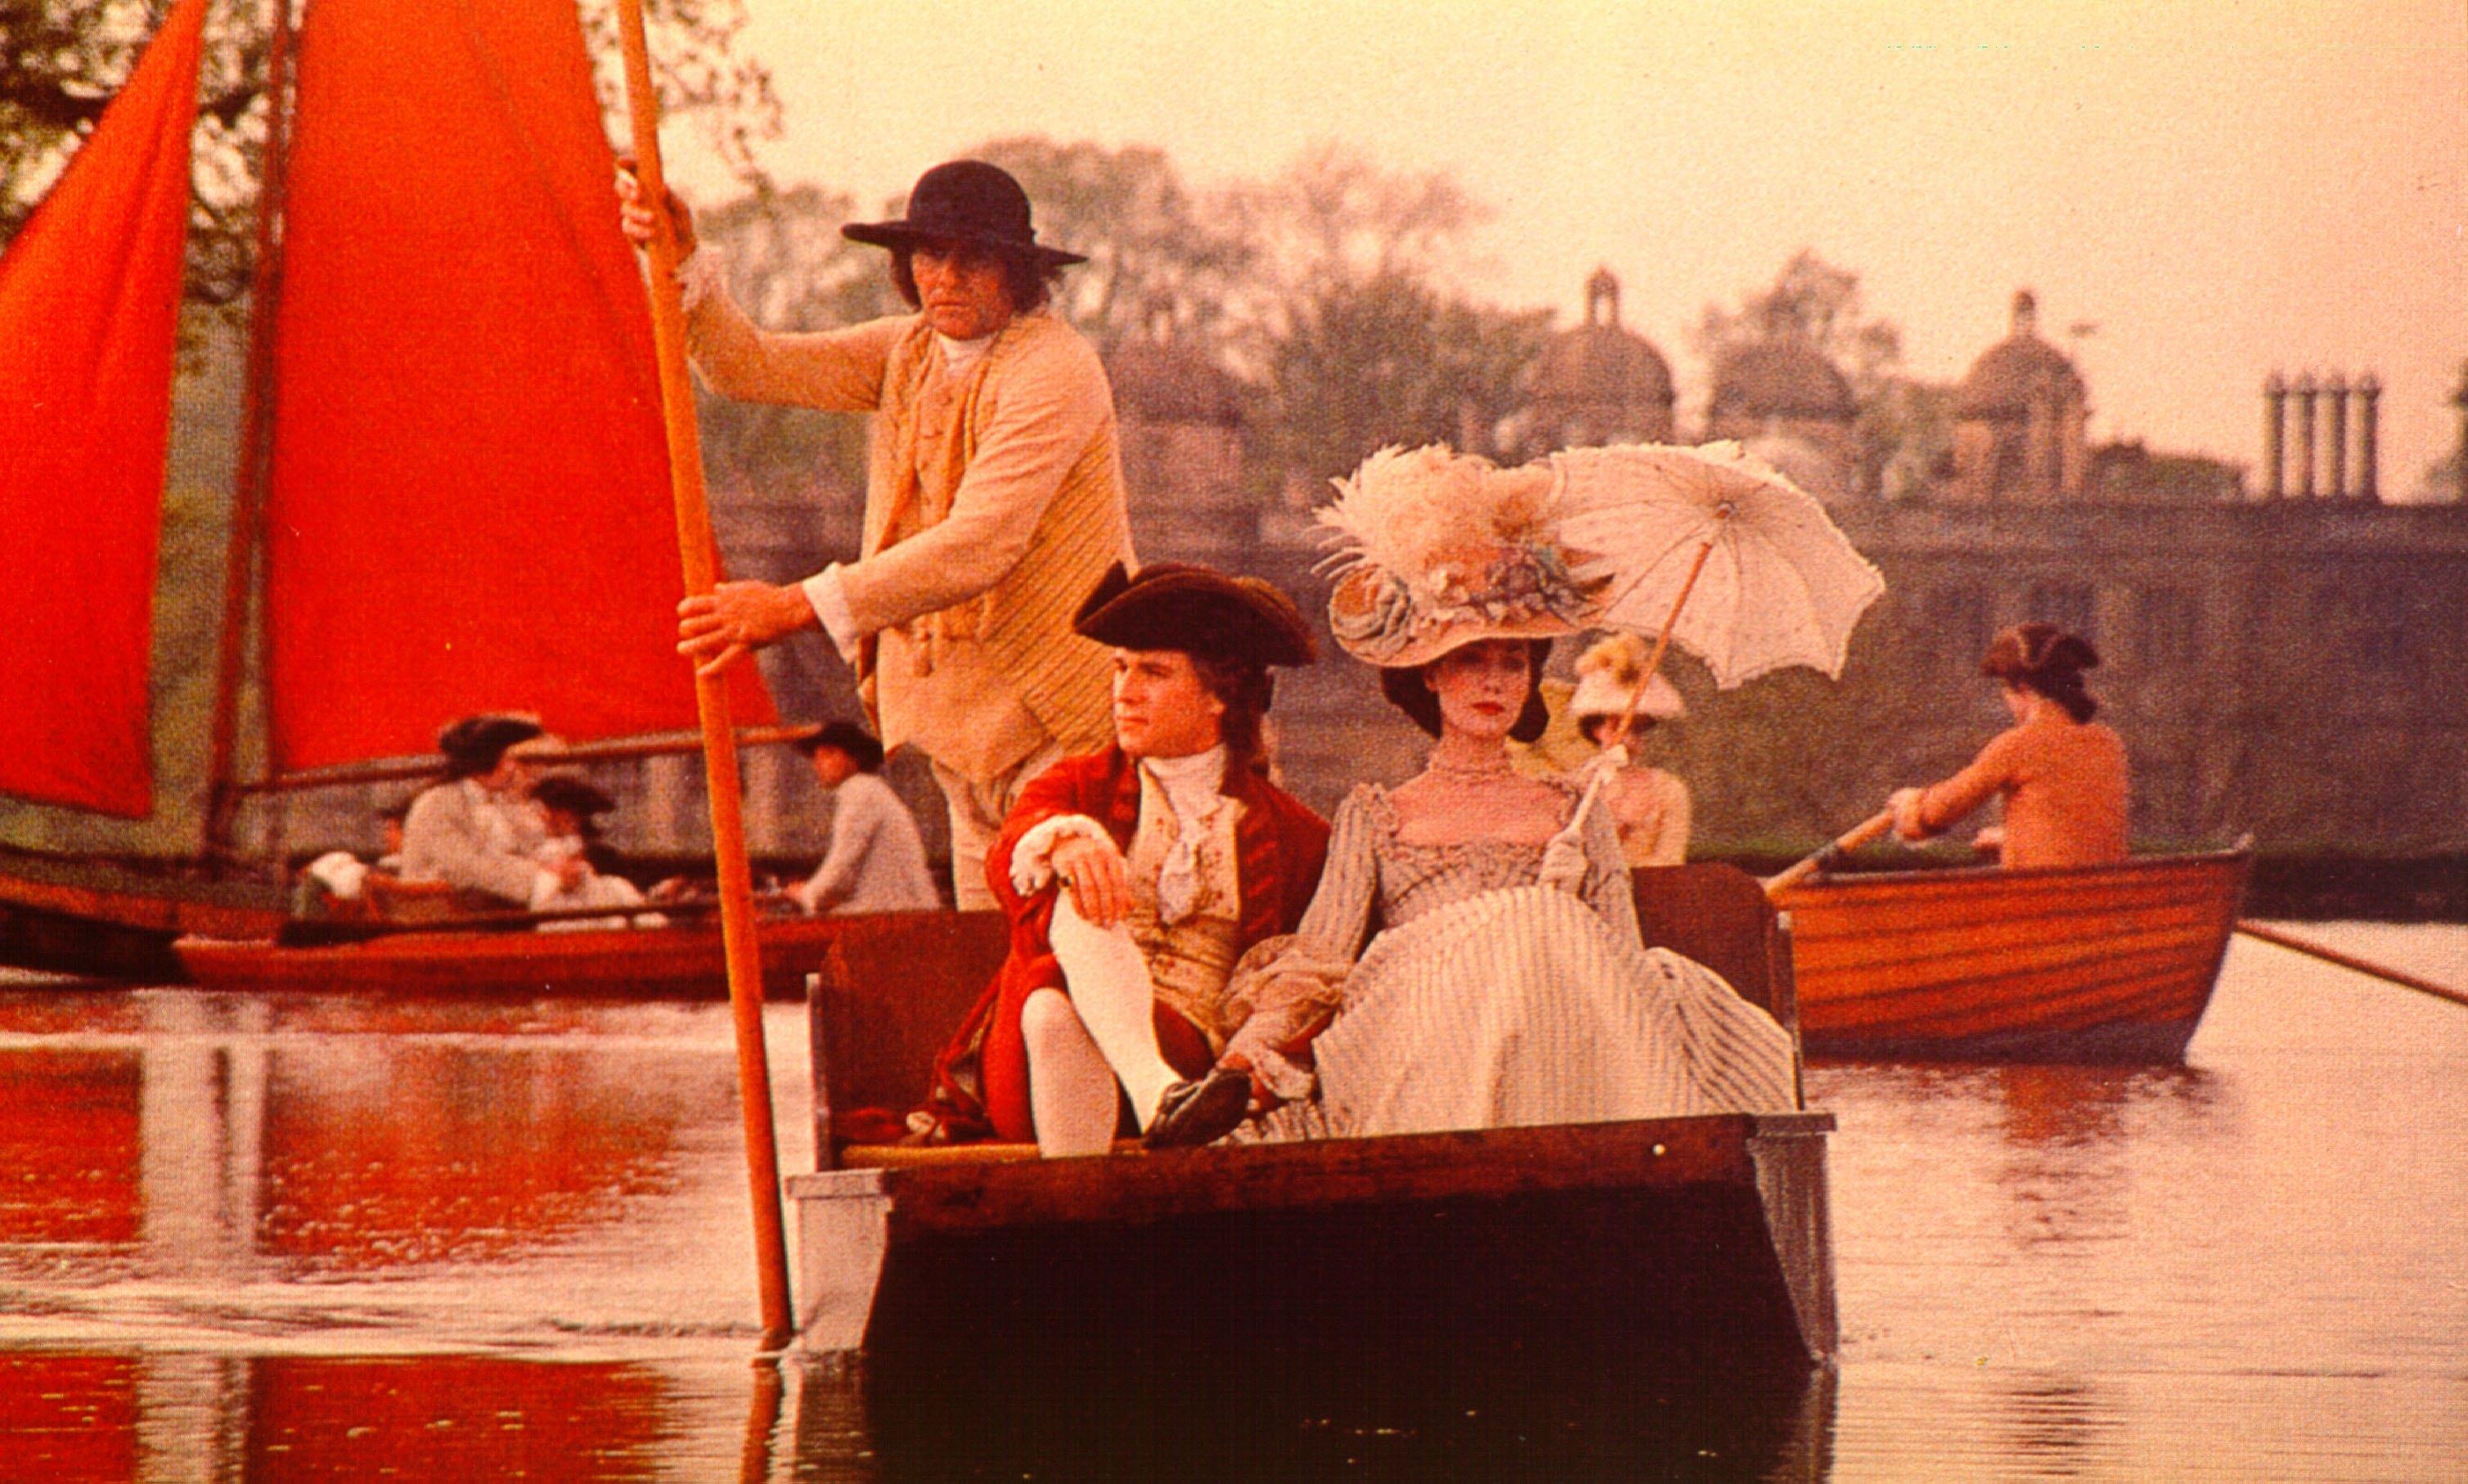 Marisa Berenson and Ryan O'Neal in Barry Lyndon (1975)